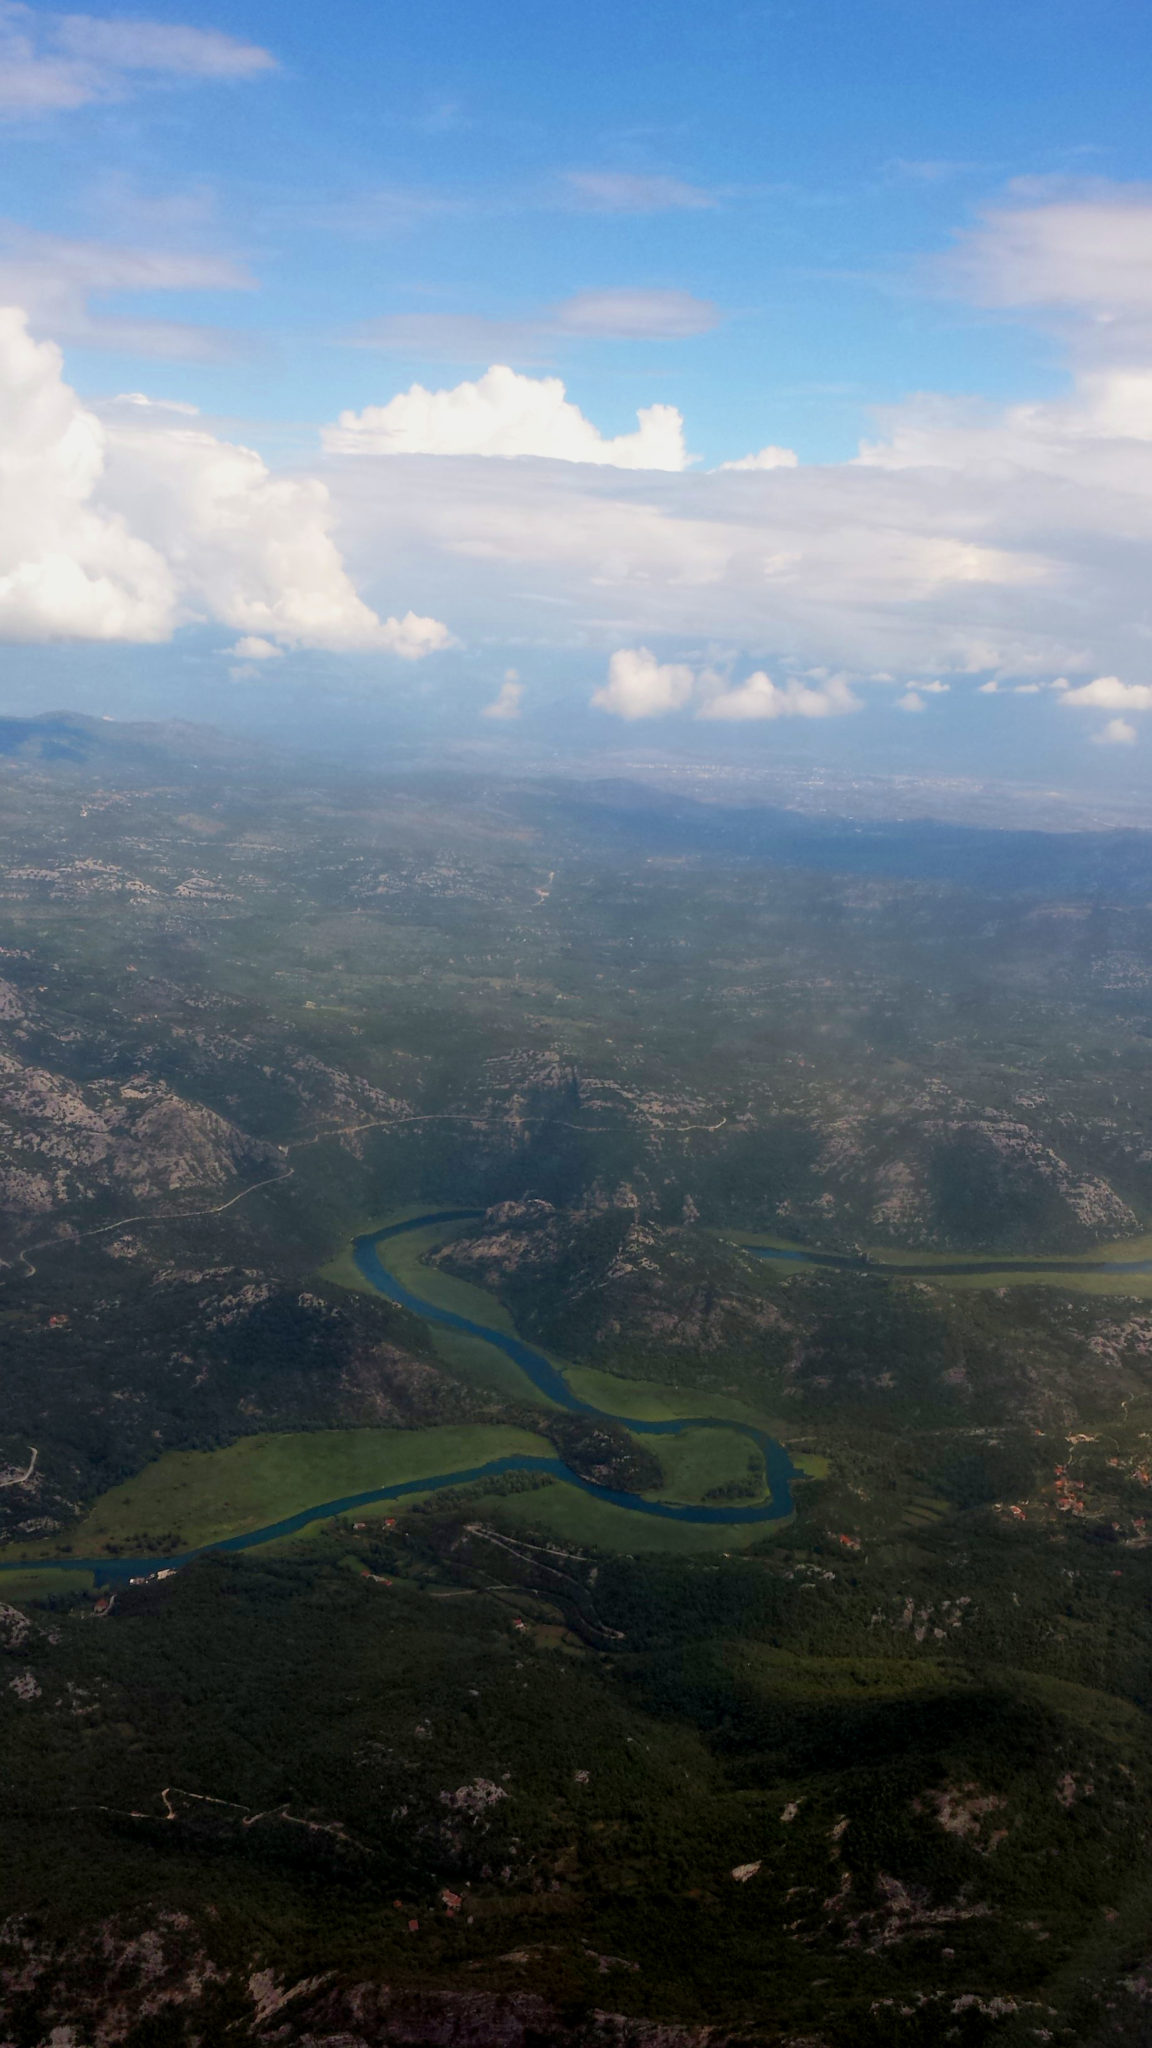 Hema_Montenegro_vue_ciel_sky_view_skadar_lake1